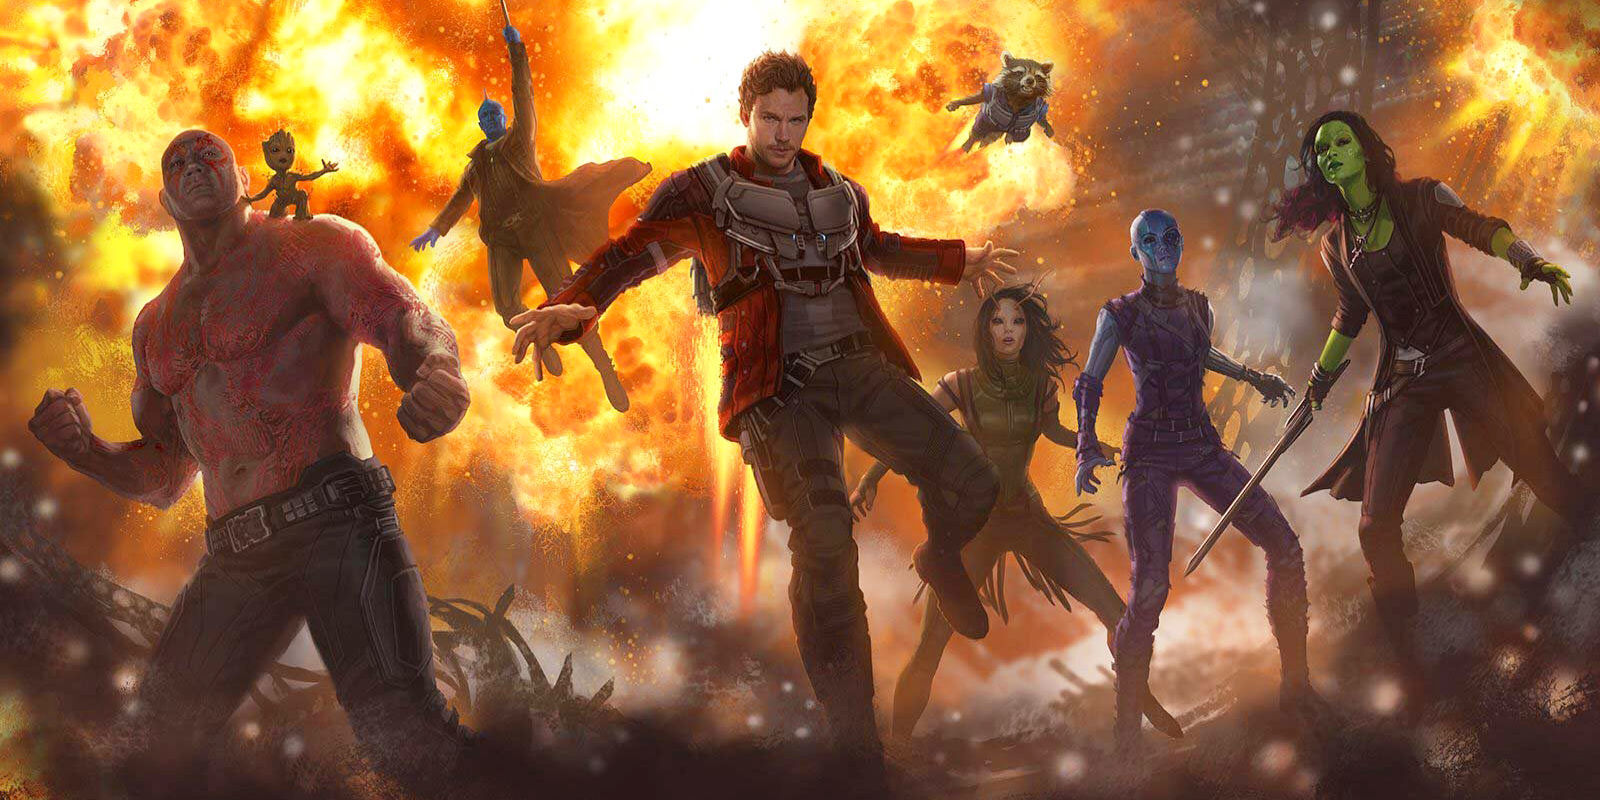 La fin des Gardiens de la Galaxie Vol. 2 – spoilers et explications